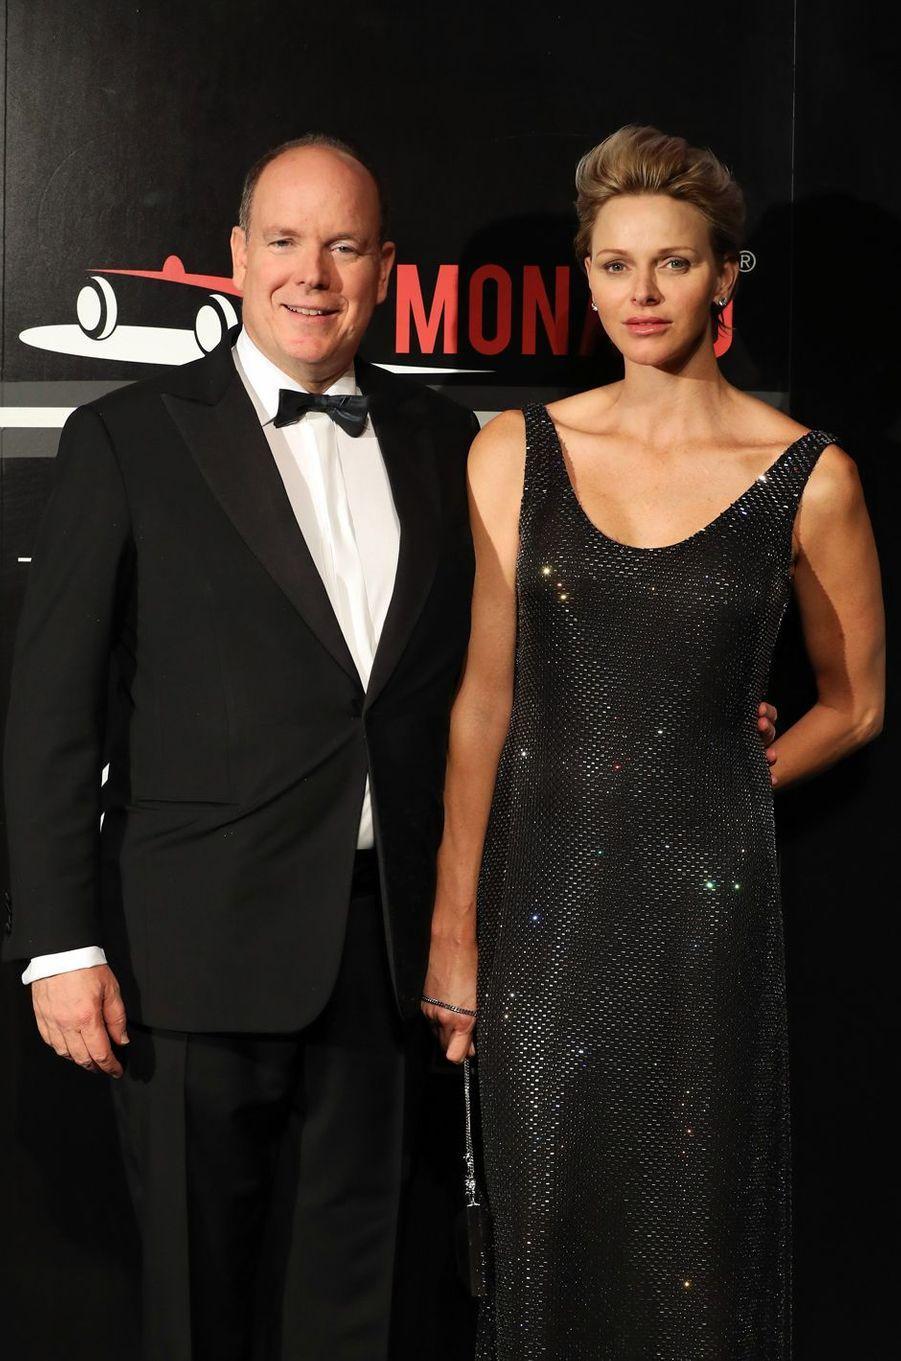 La princesse Charlène et le prince Albert II de Monaco à Monaco, le 27 mai 2018